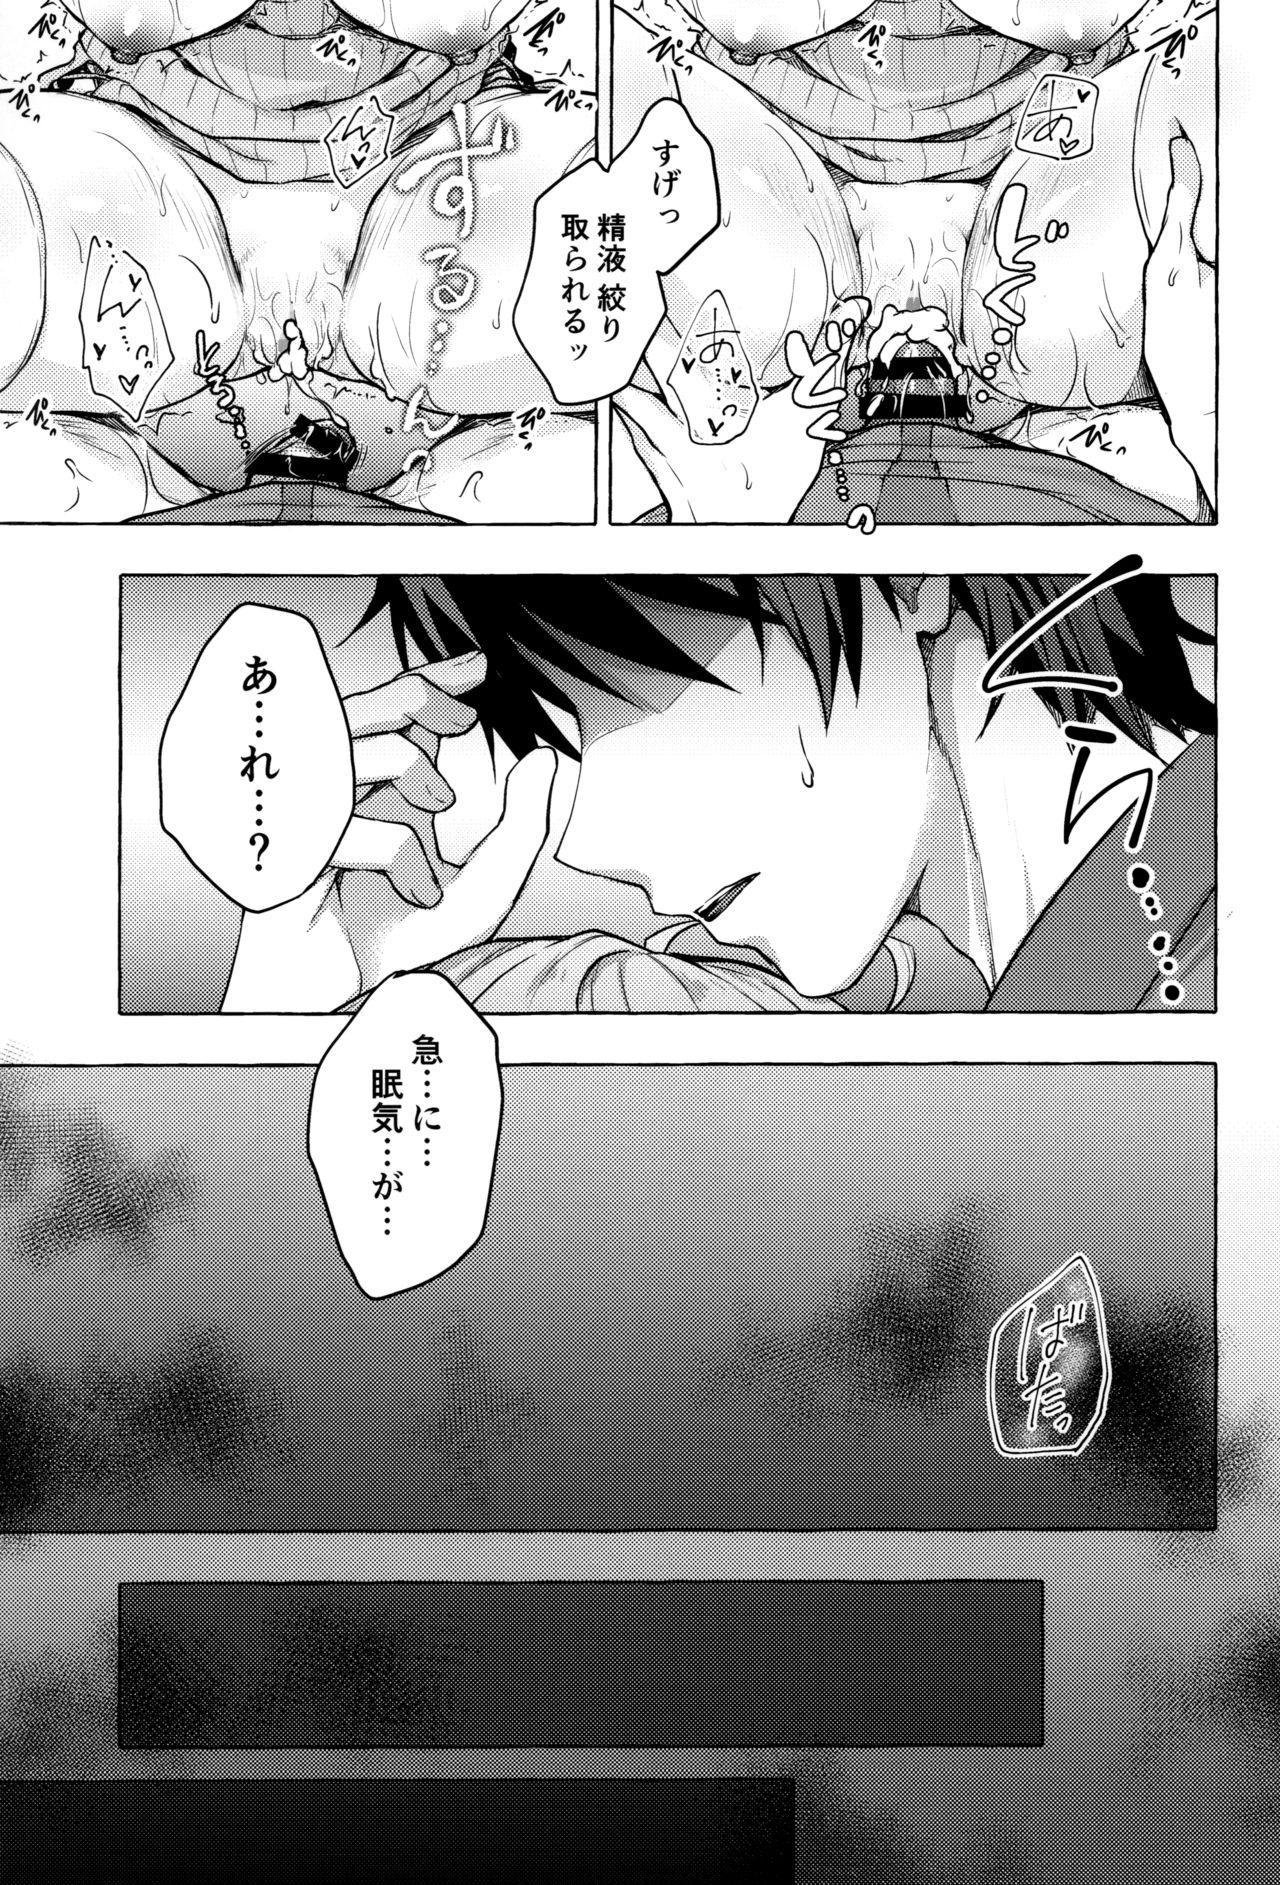 (C96) [Kinokonomi (konomi)] Saimin Usami-san -Nyancologism 2- 17